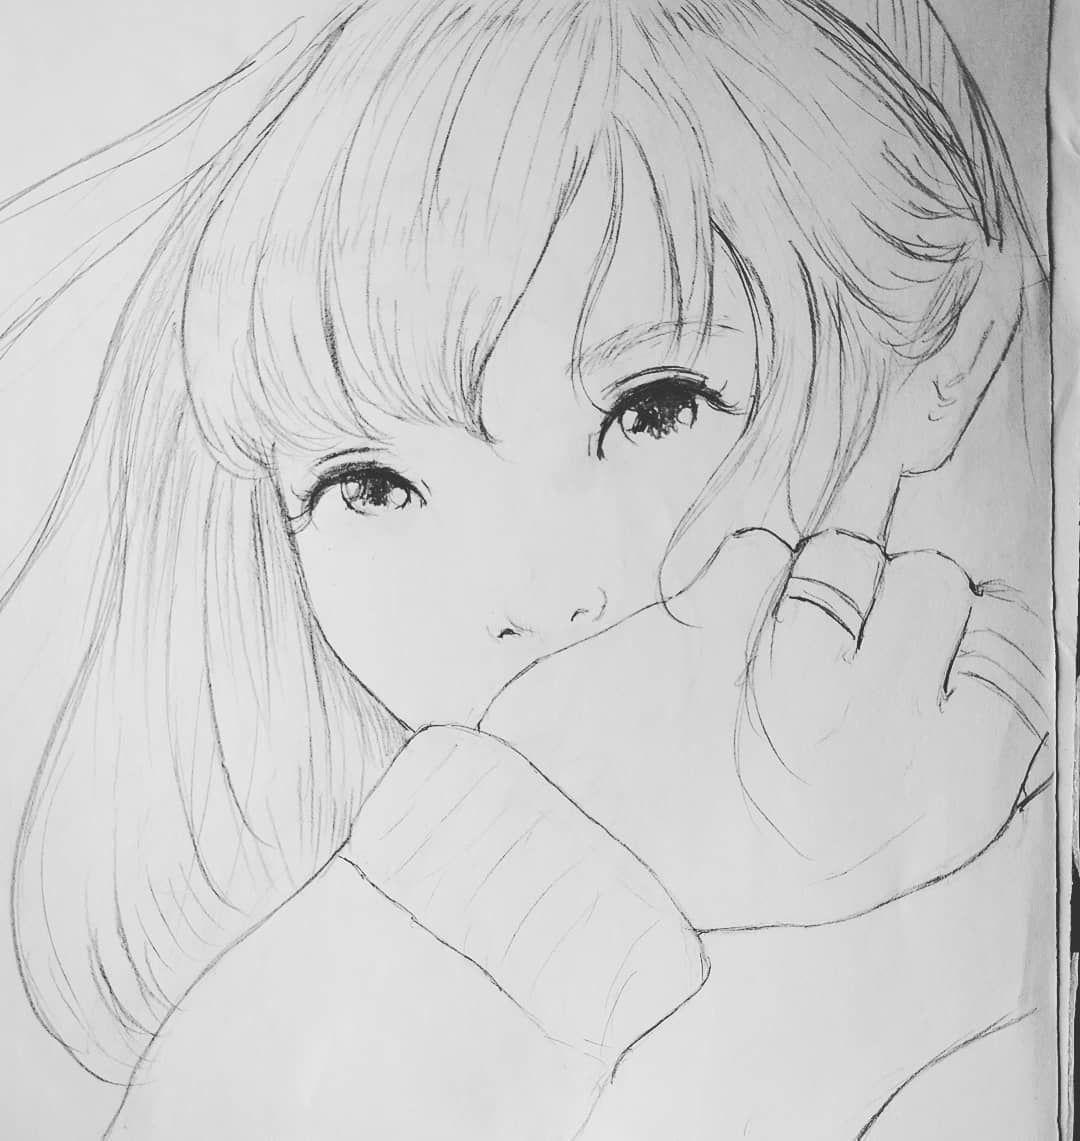 Pin By Oliwciaaa 122 On Rysunki Drawings Manga Artist Art Day